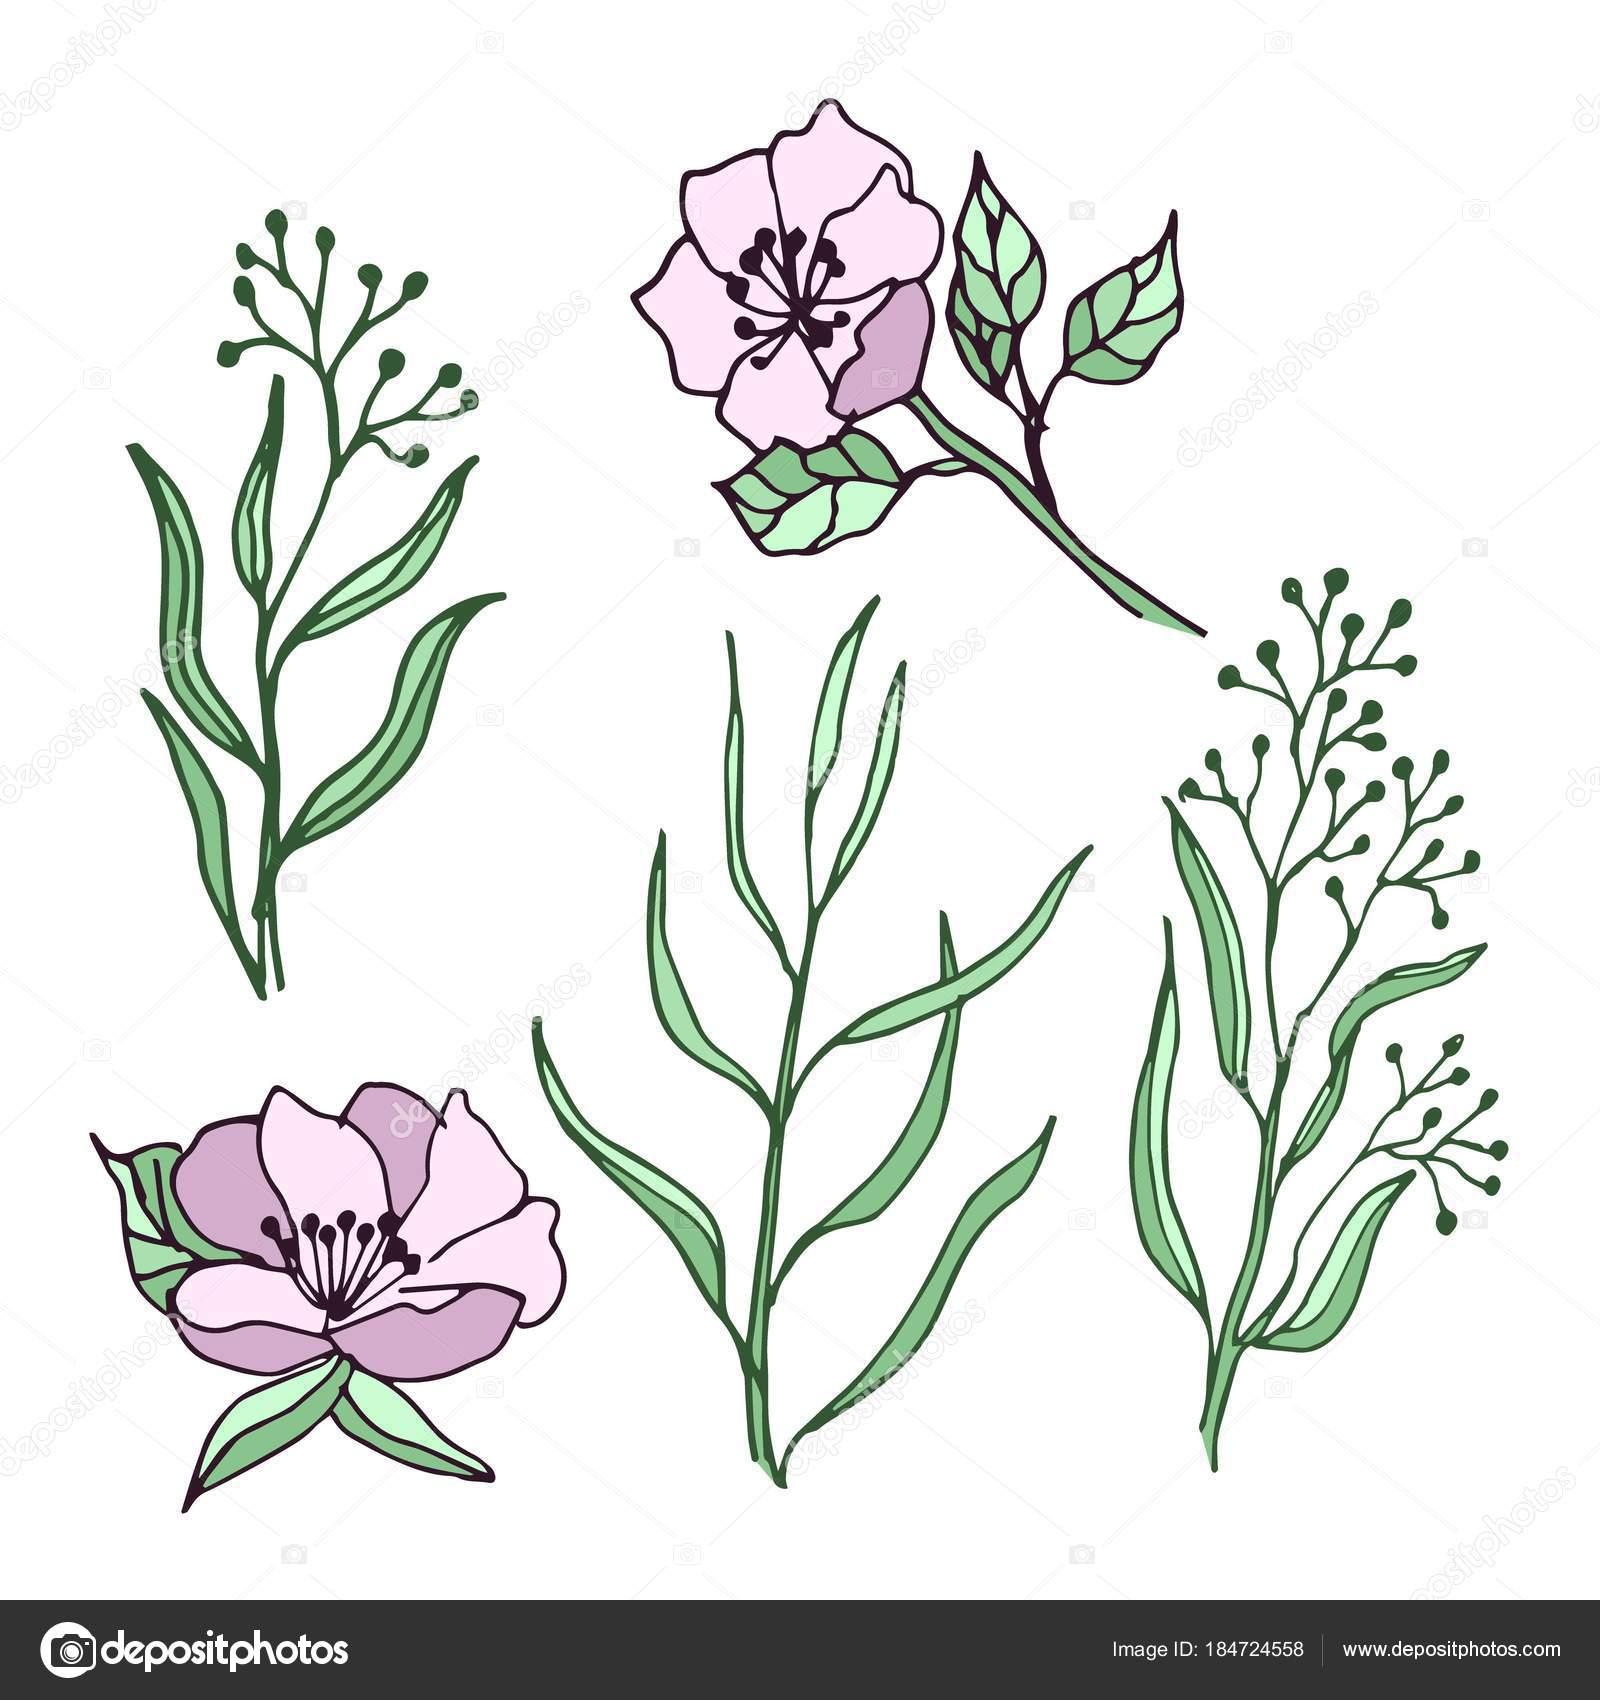 Jarni Kvety Listy Sada Vykresu Idealni Pro Pouziti Svatebni Pozvanky